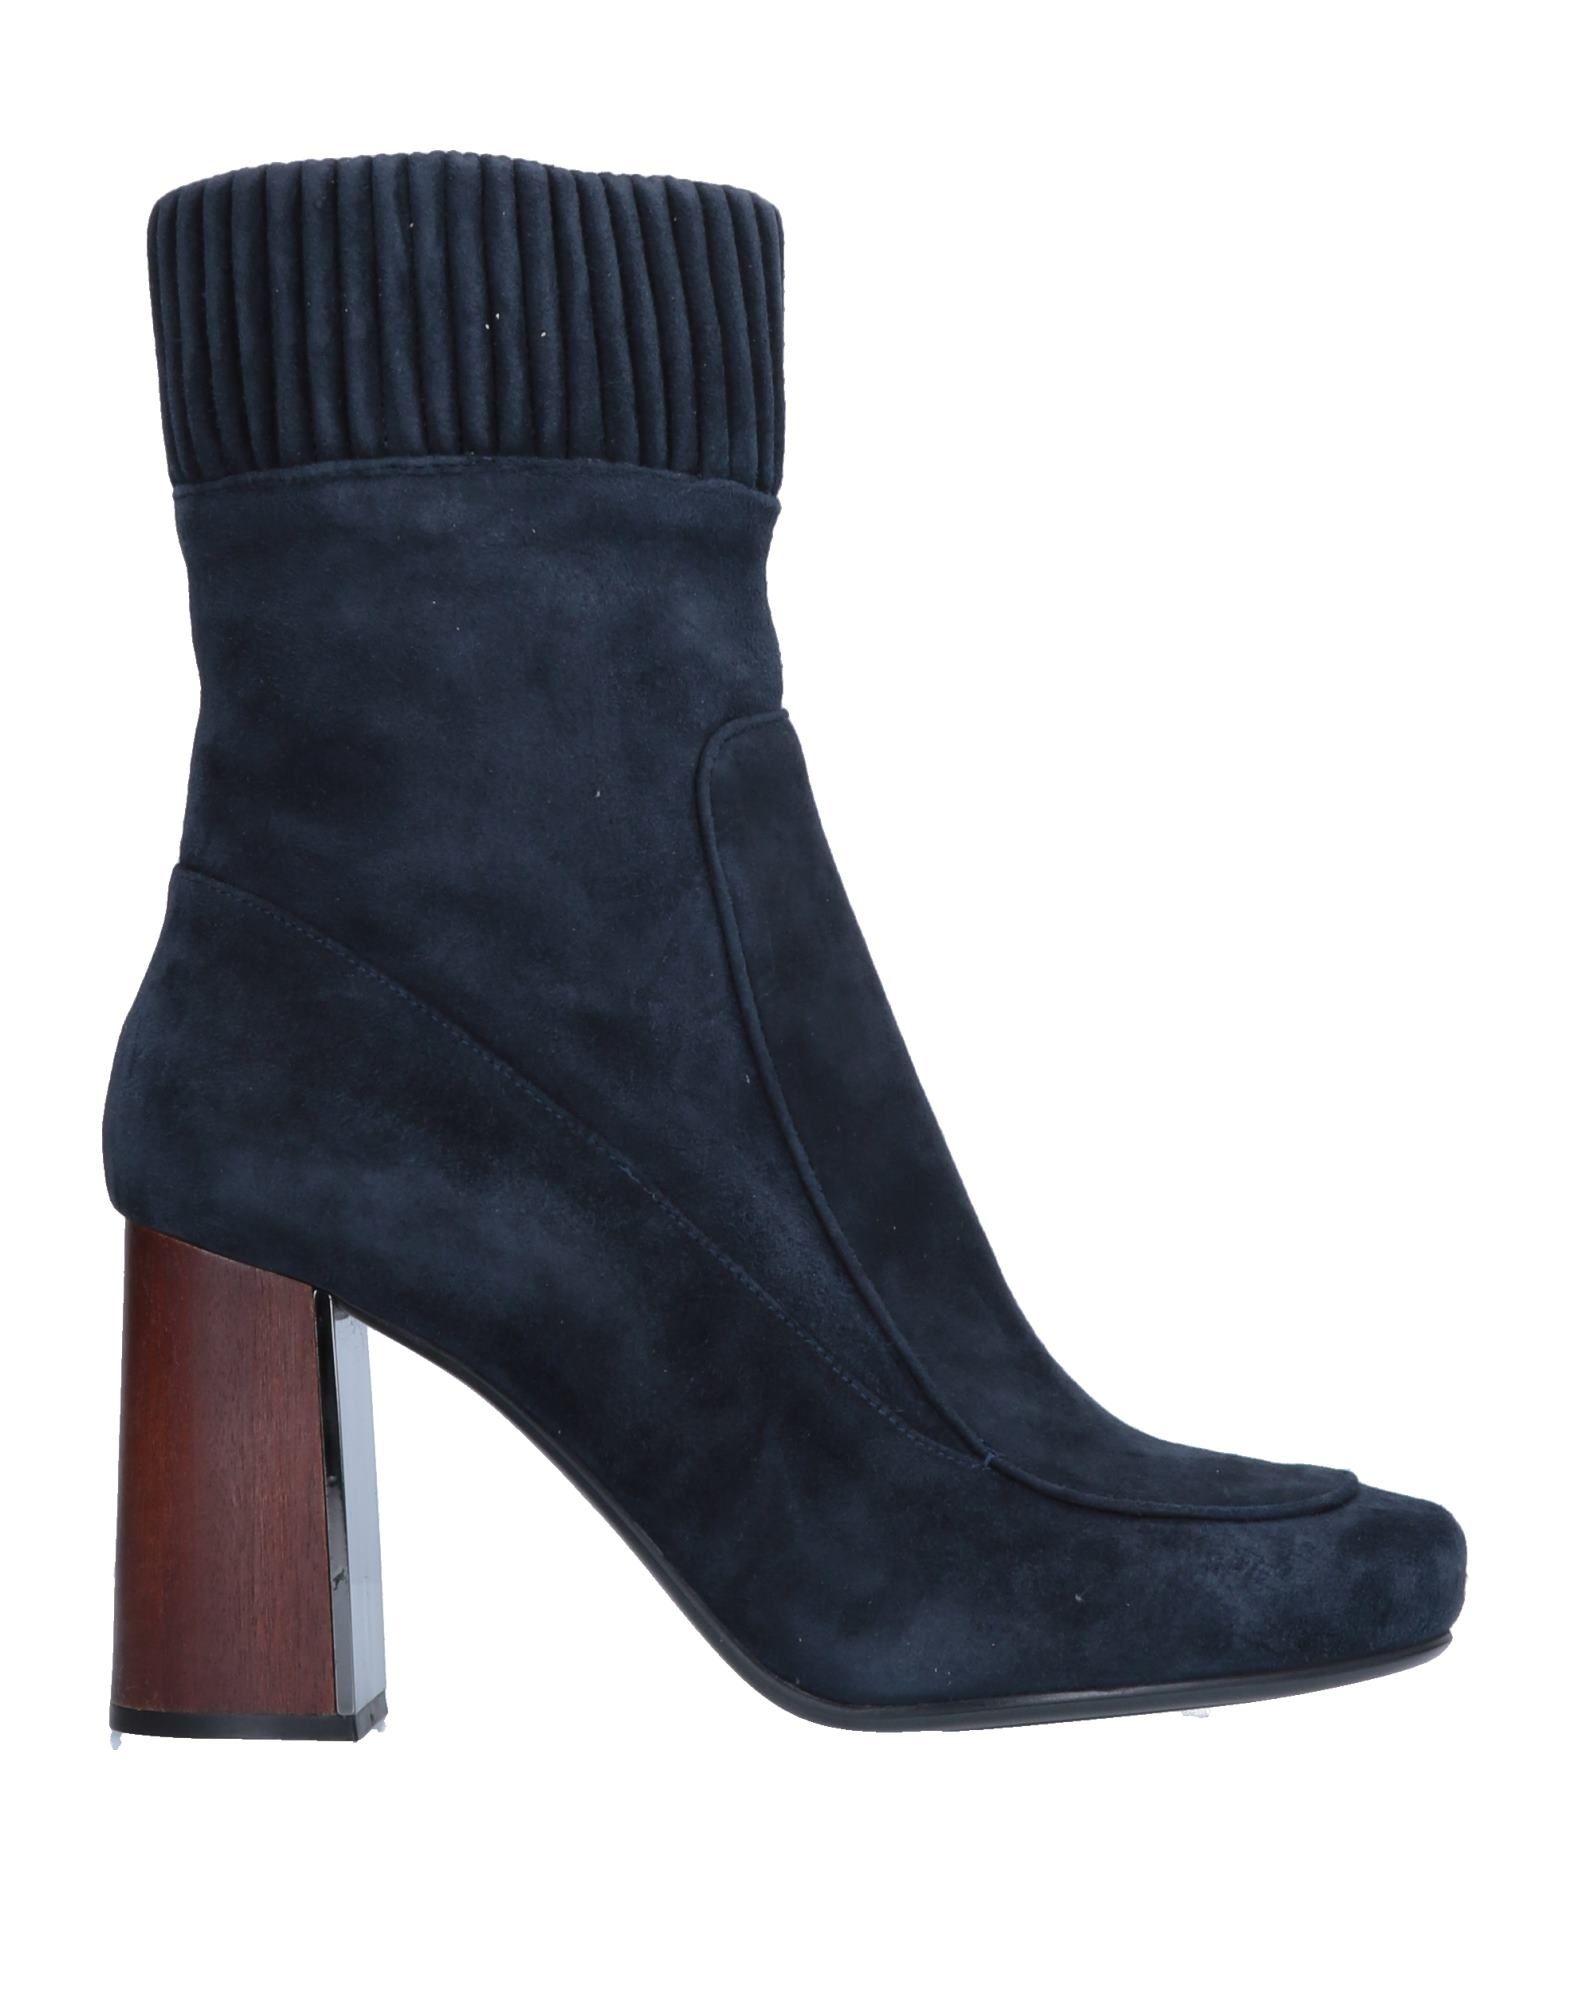 Lola Cruz Ankle Boot Ankle - Women Lola Cruz Ankle Boot Boots online on  Australia - 11248385LV 06288c